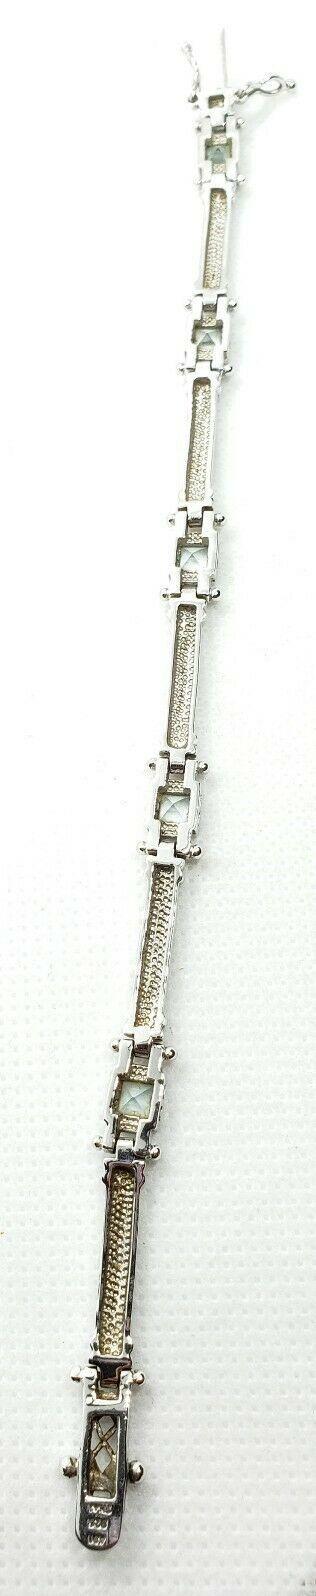 "ADI 7.25"" Sterling Silver 925 Light Blue Topaz Tennis Link Bracelet image 5"